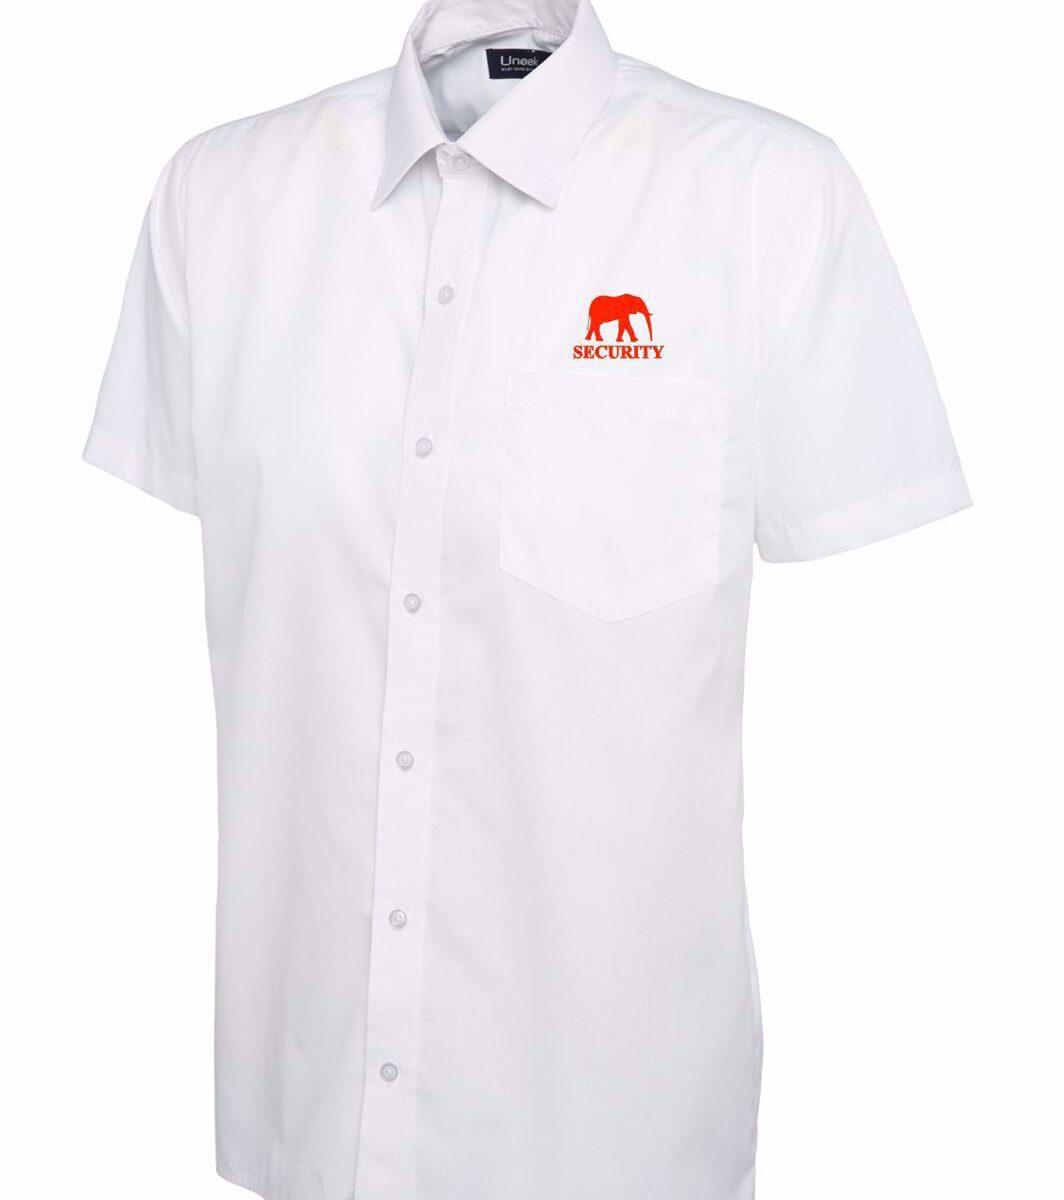 Red Elephant Security Poplin Shirt - UC710